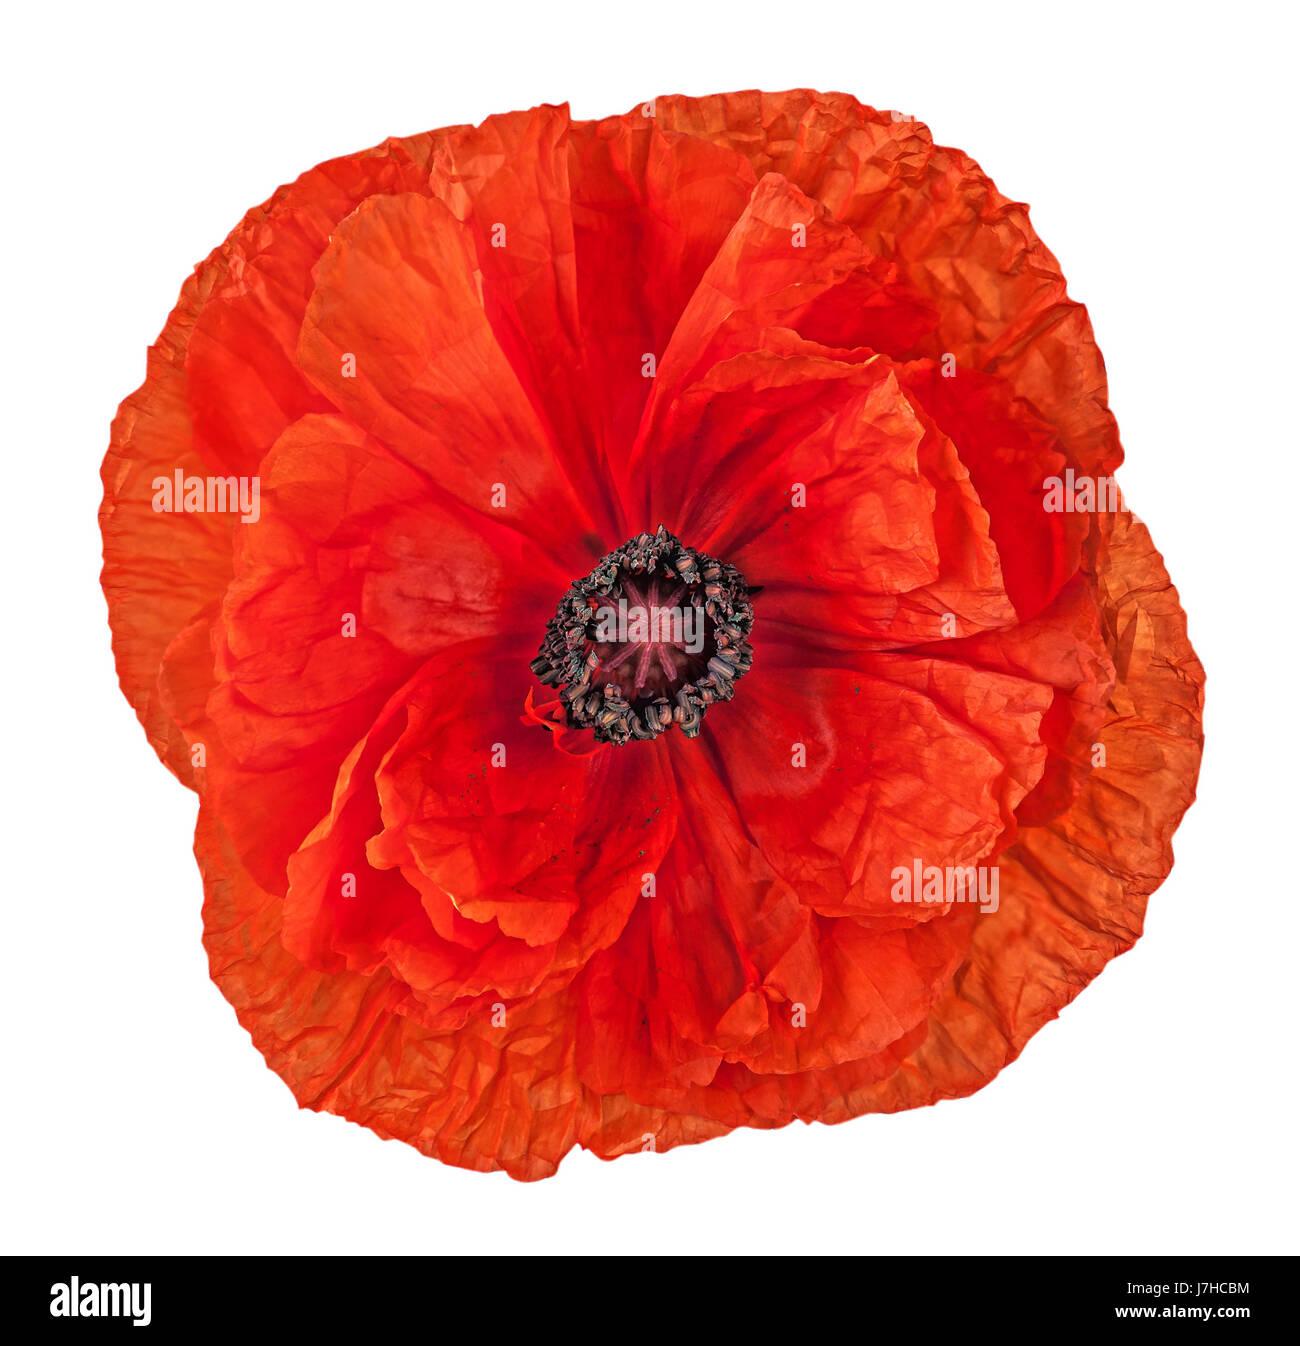 Closeup red poppy flower - Stock Image